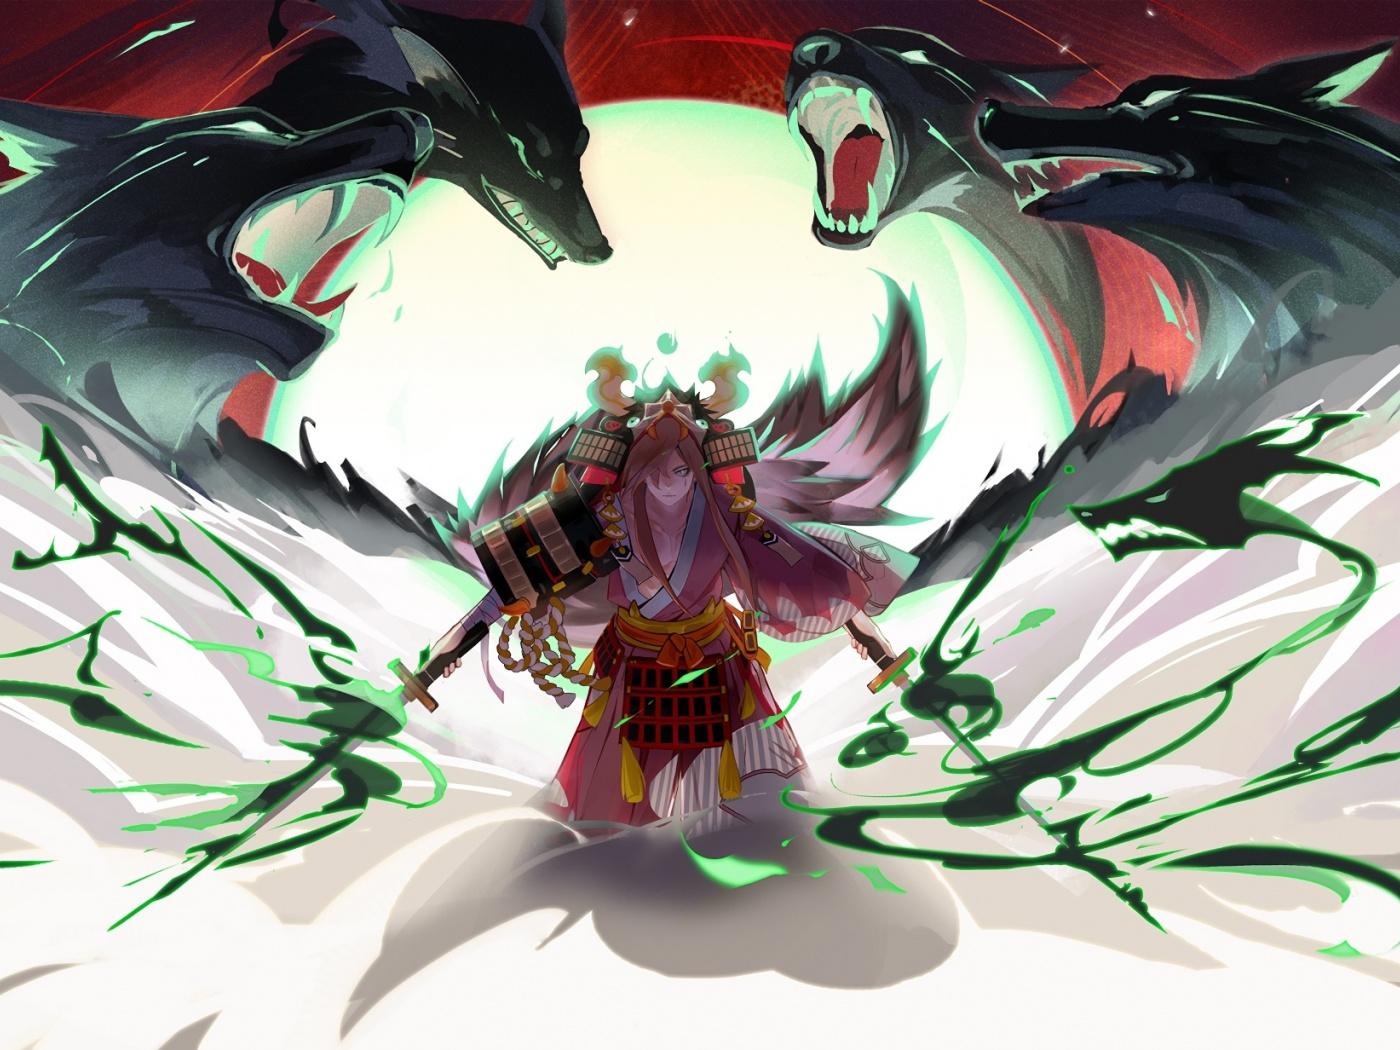 Ninja Anime Wallpaper Posted By Ryan Anderson